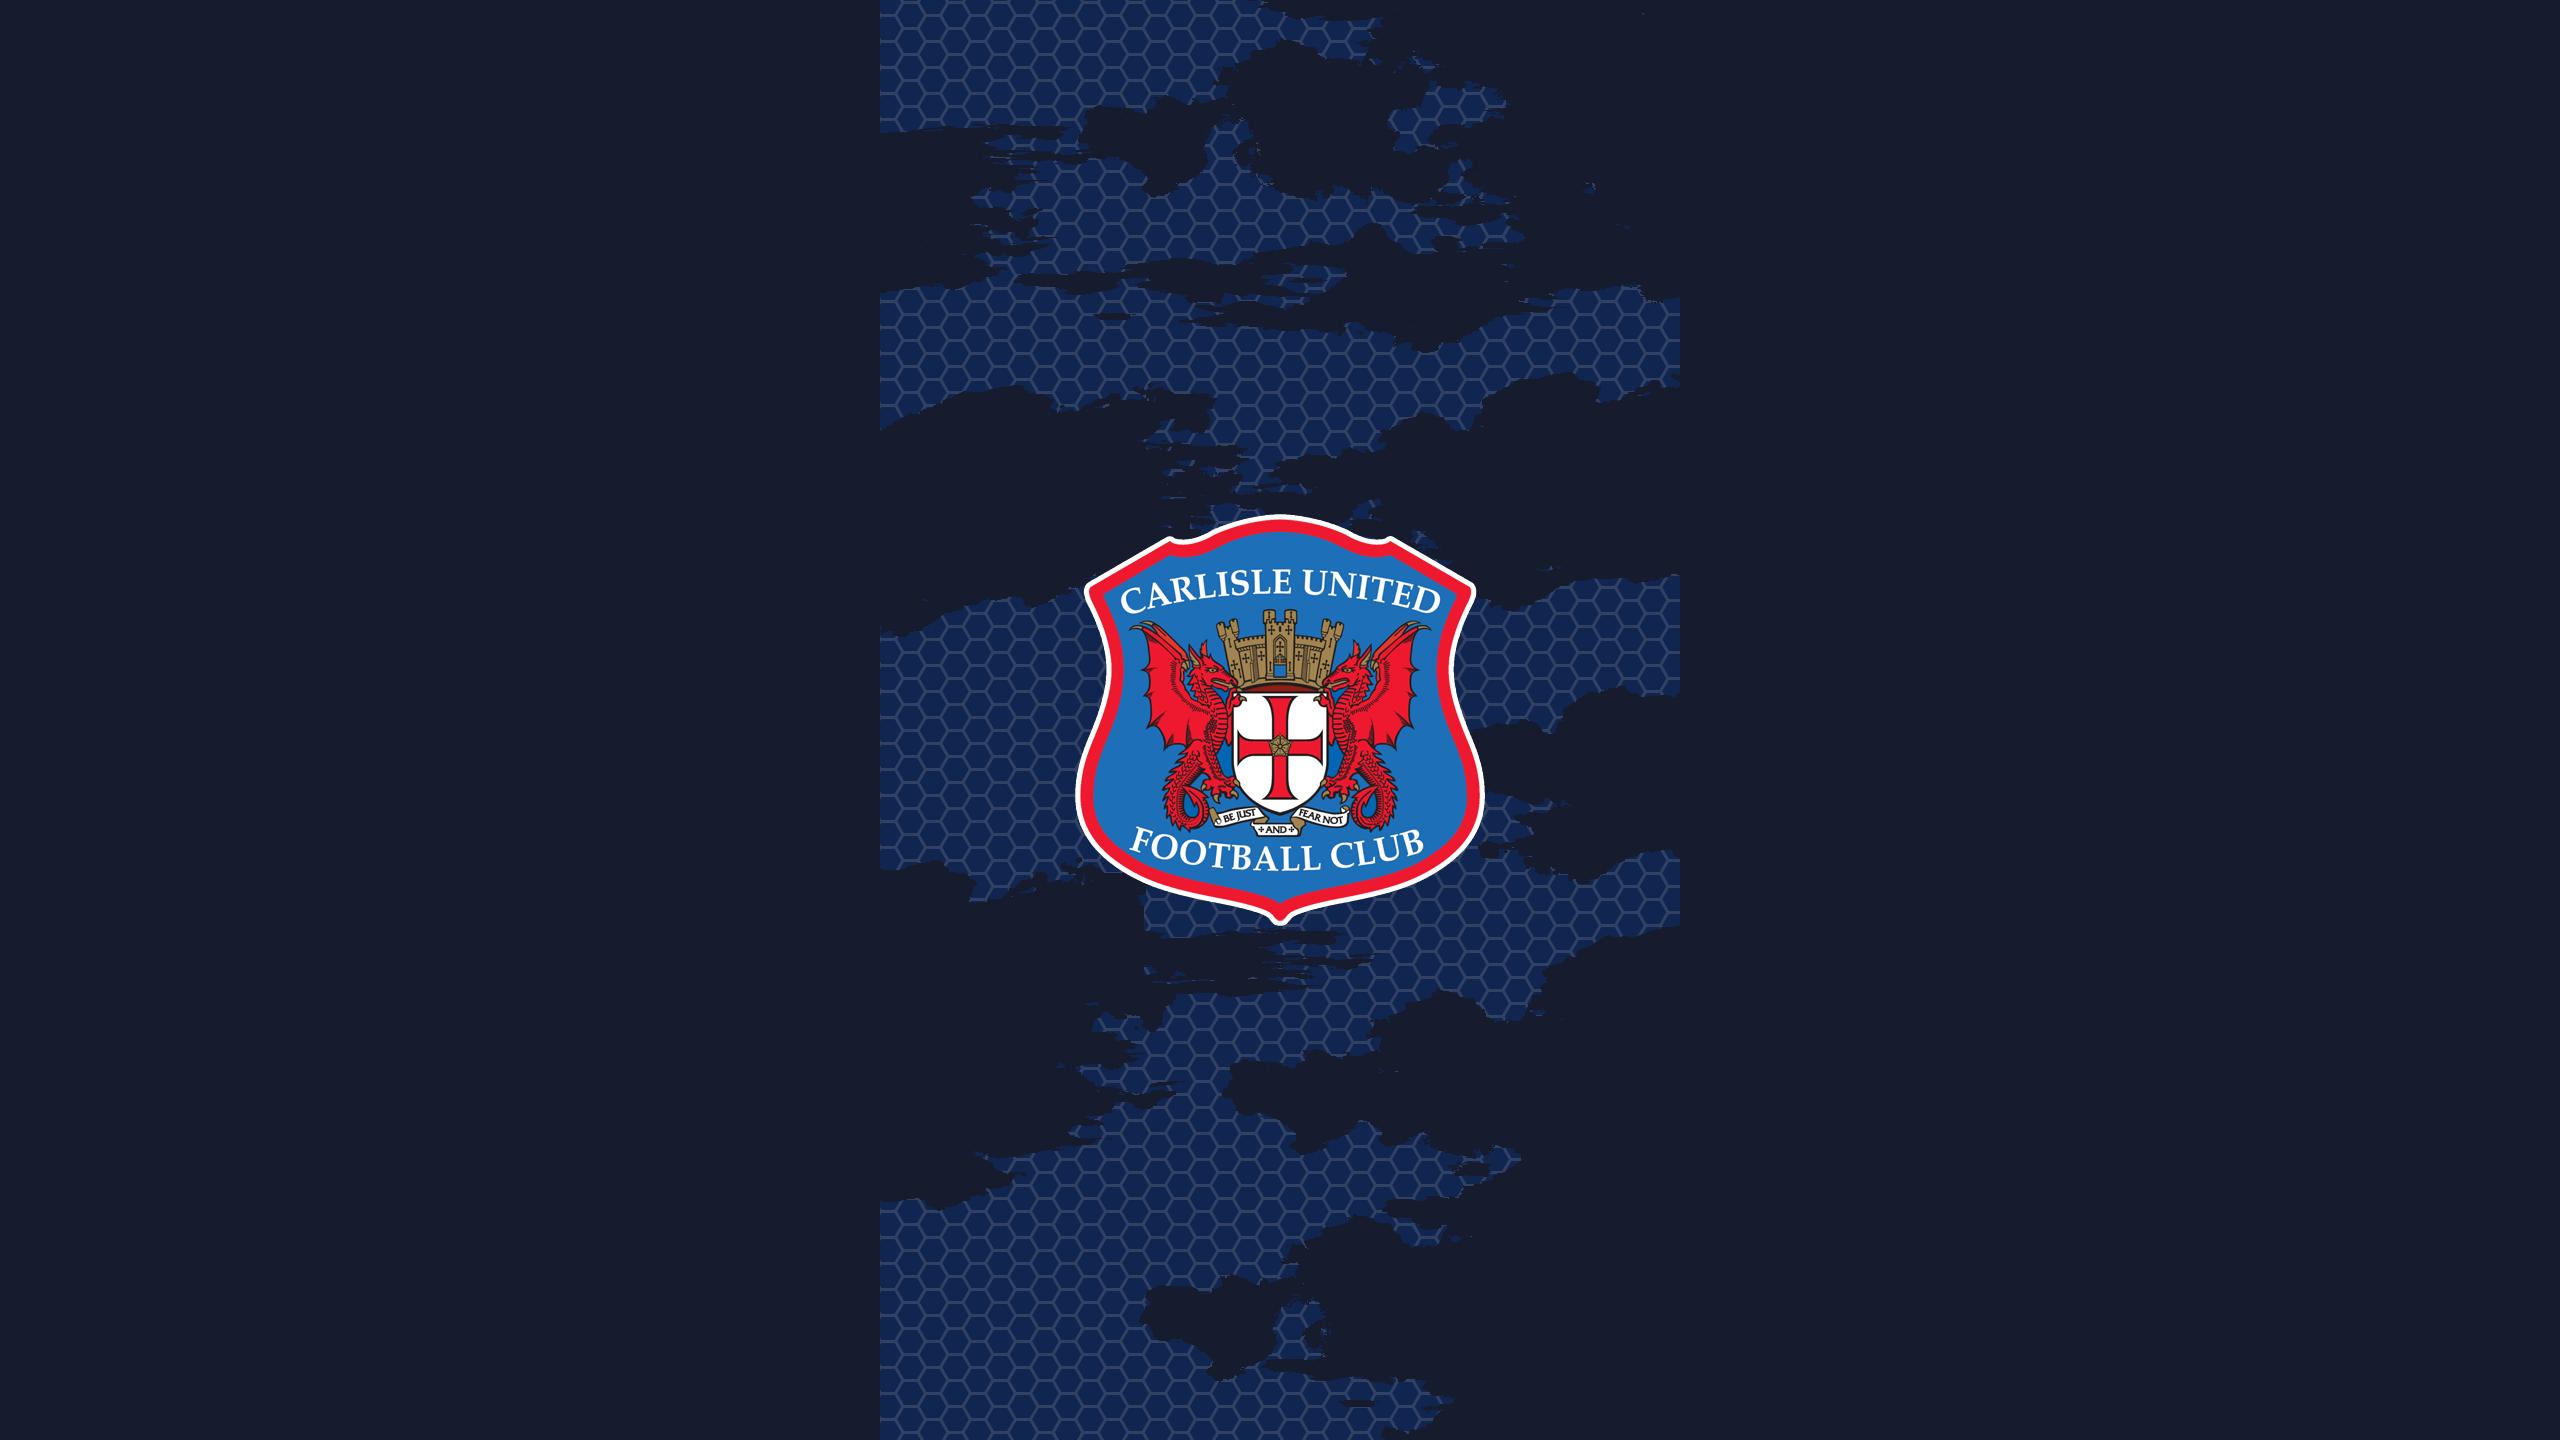 Carlisle United FC